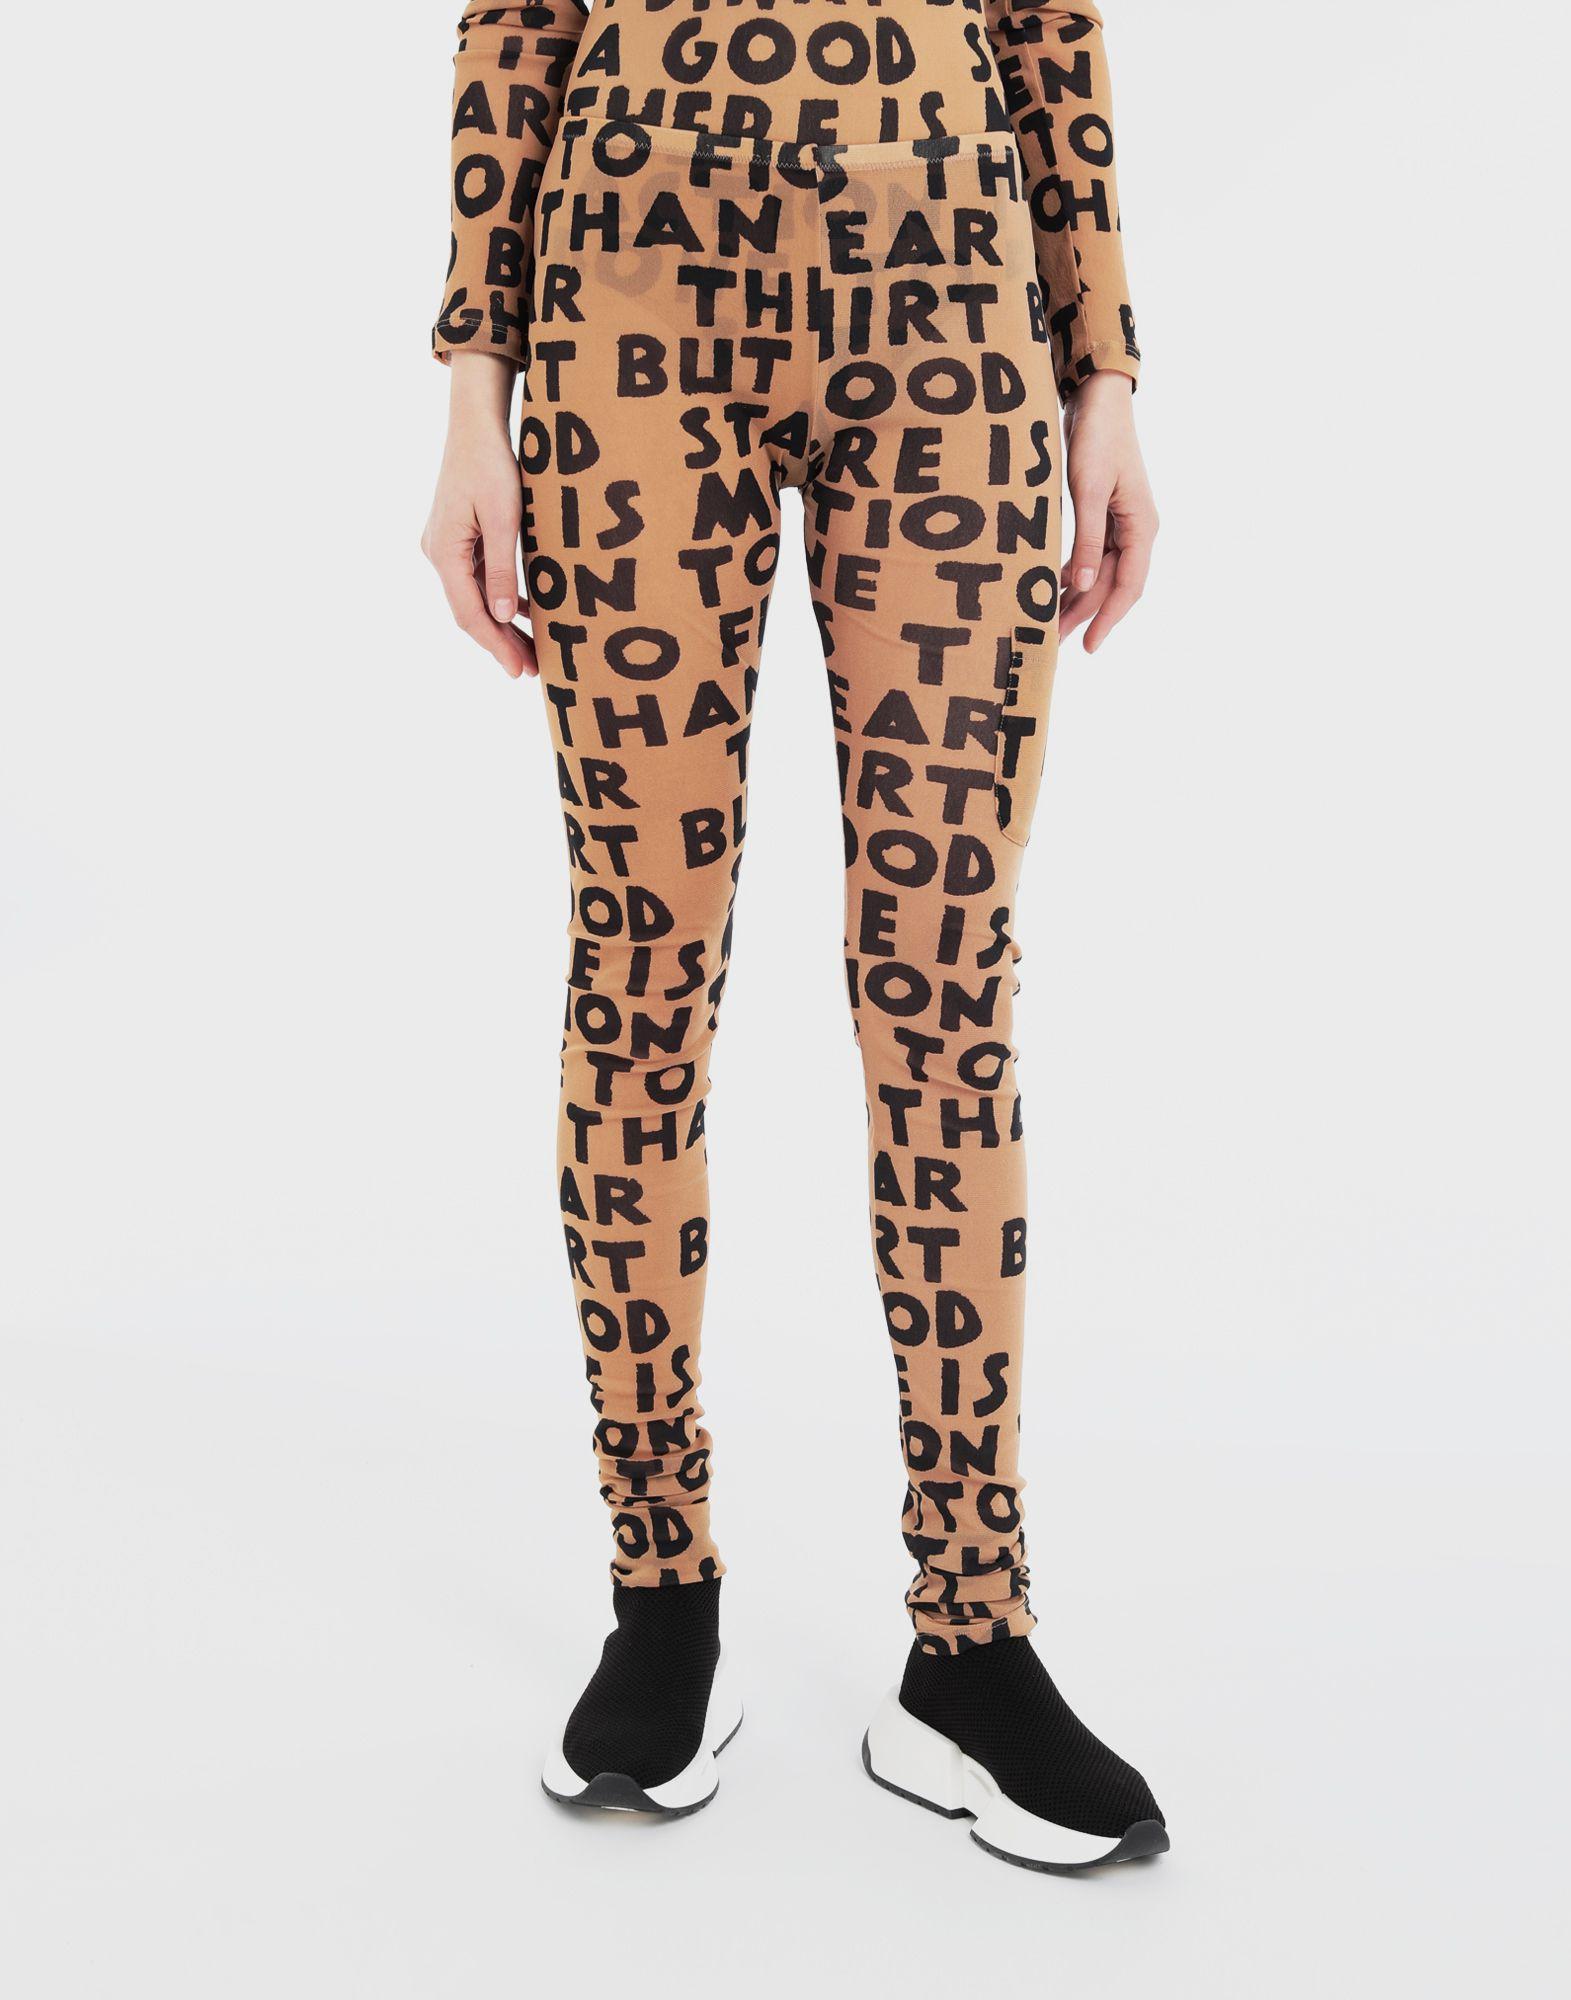 MM6 MAISON MARGIELA Charity AIDS-print leggings Casual pants Woman r